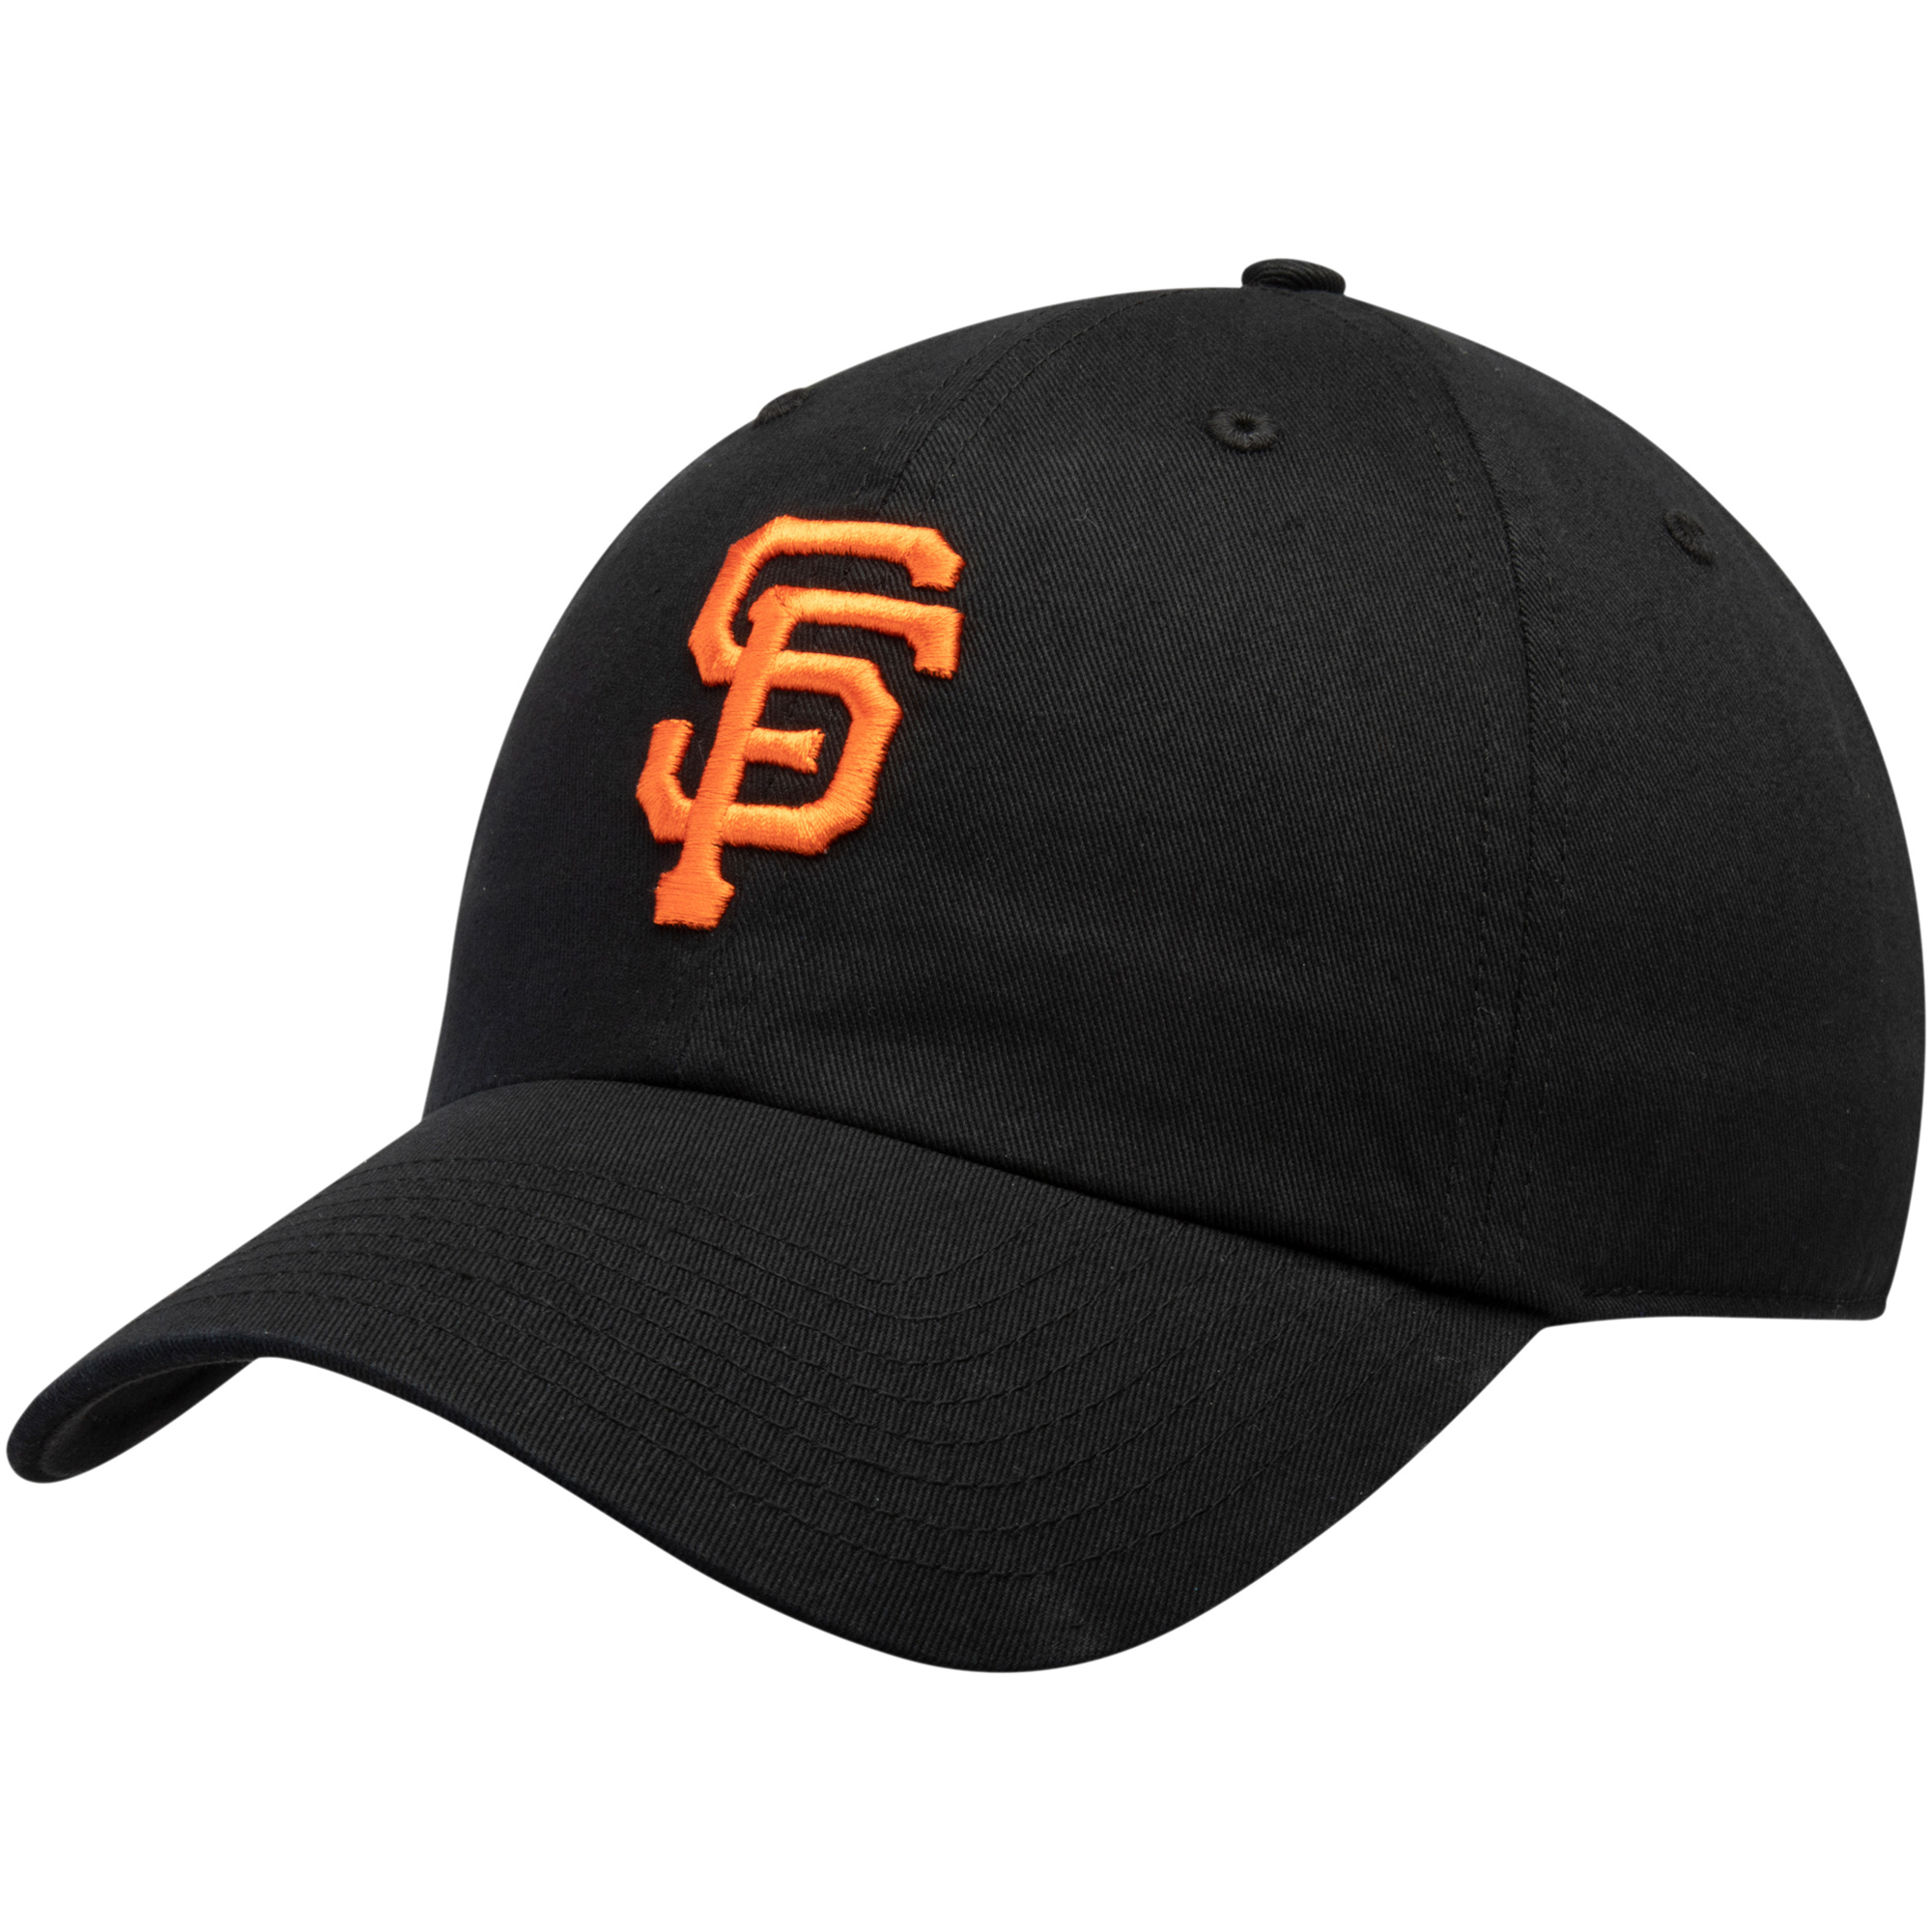 San Francisco Giants Fan Favorite Primary Logo Clean Up Adjustable Hat - Black - OSFA